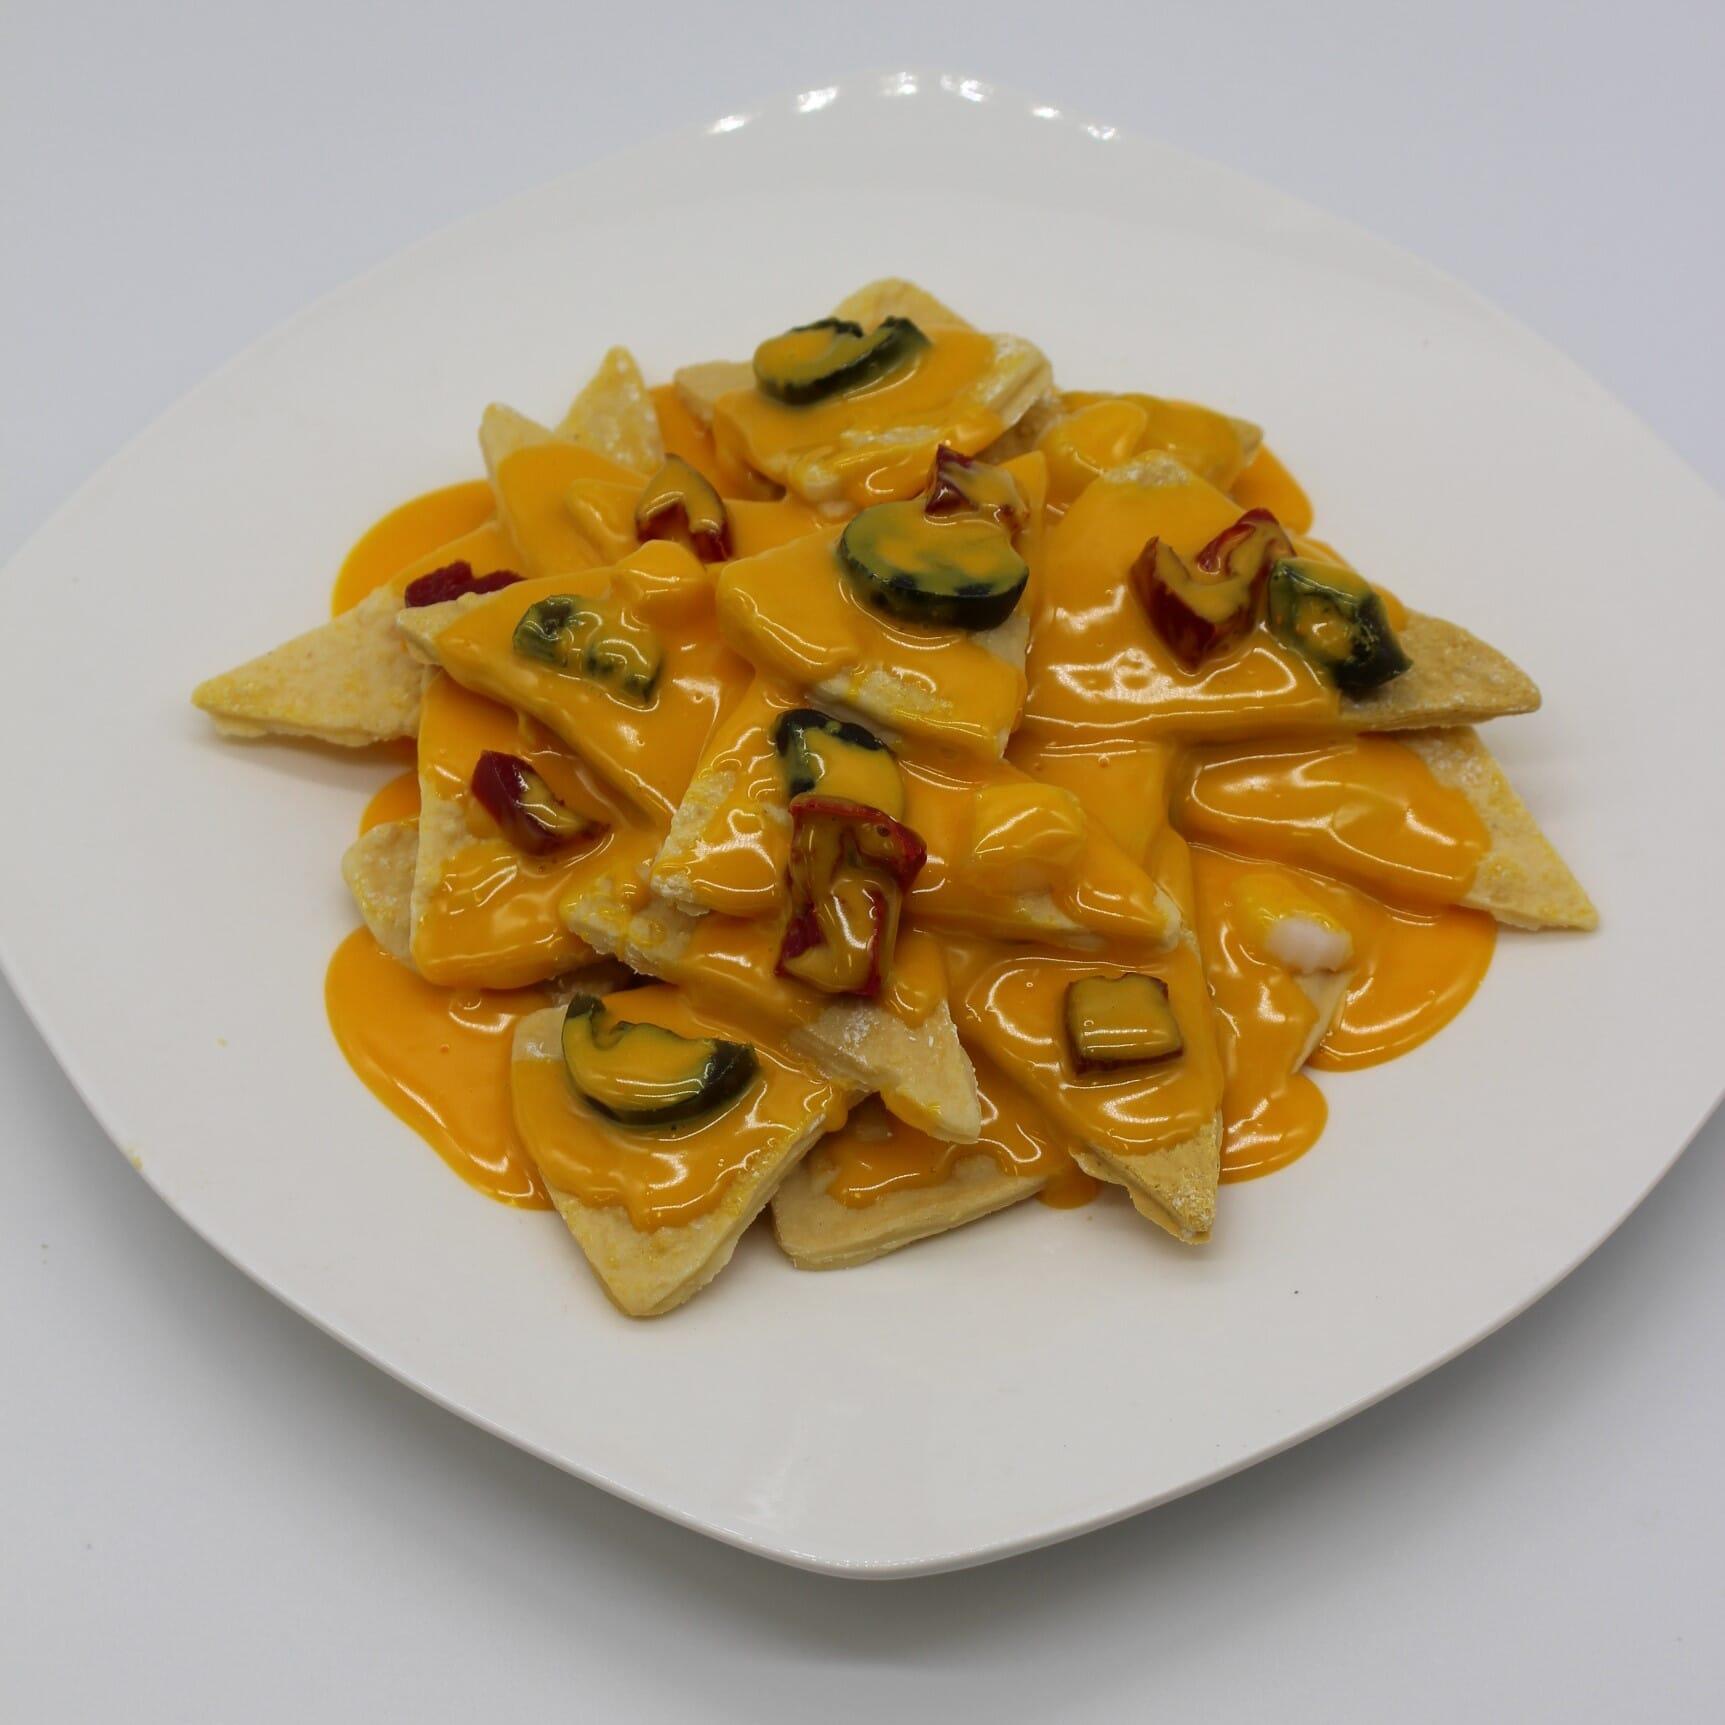 Fake Nachos with Cheese Sauce